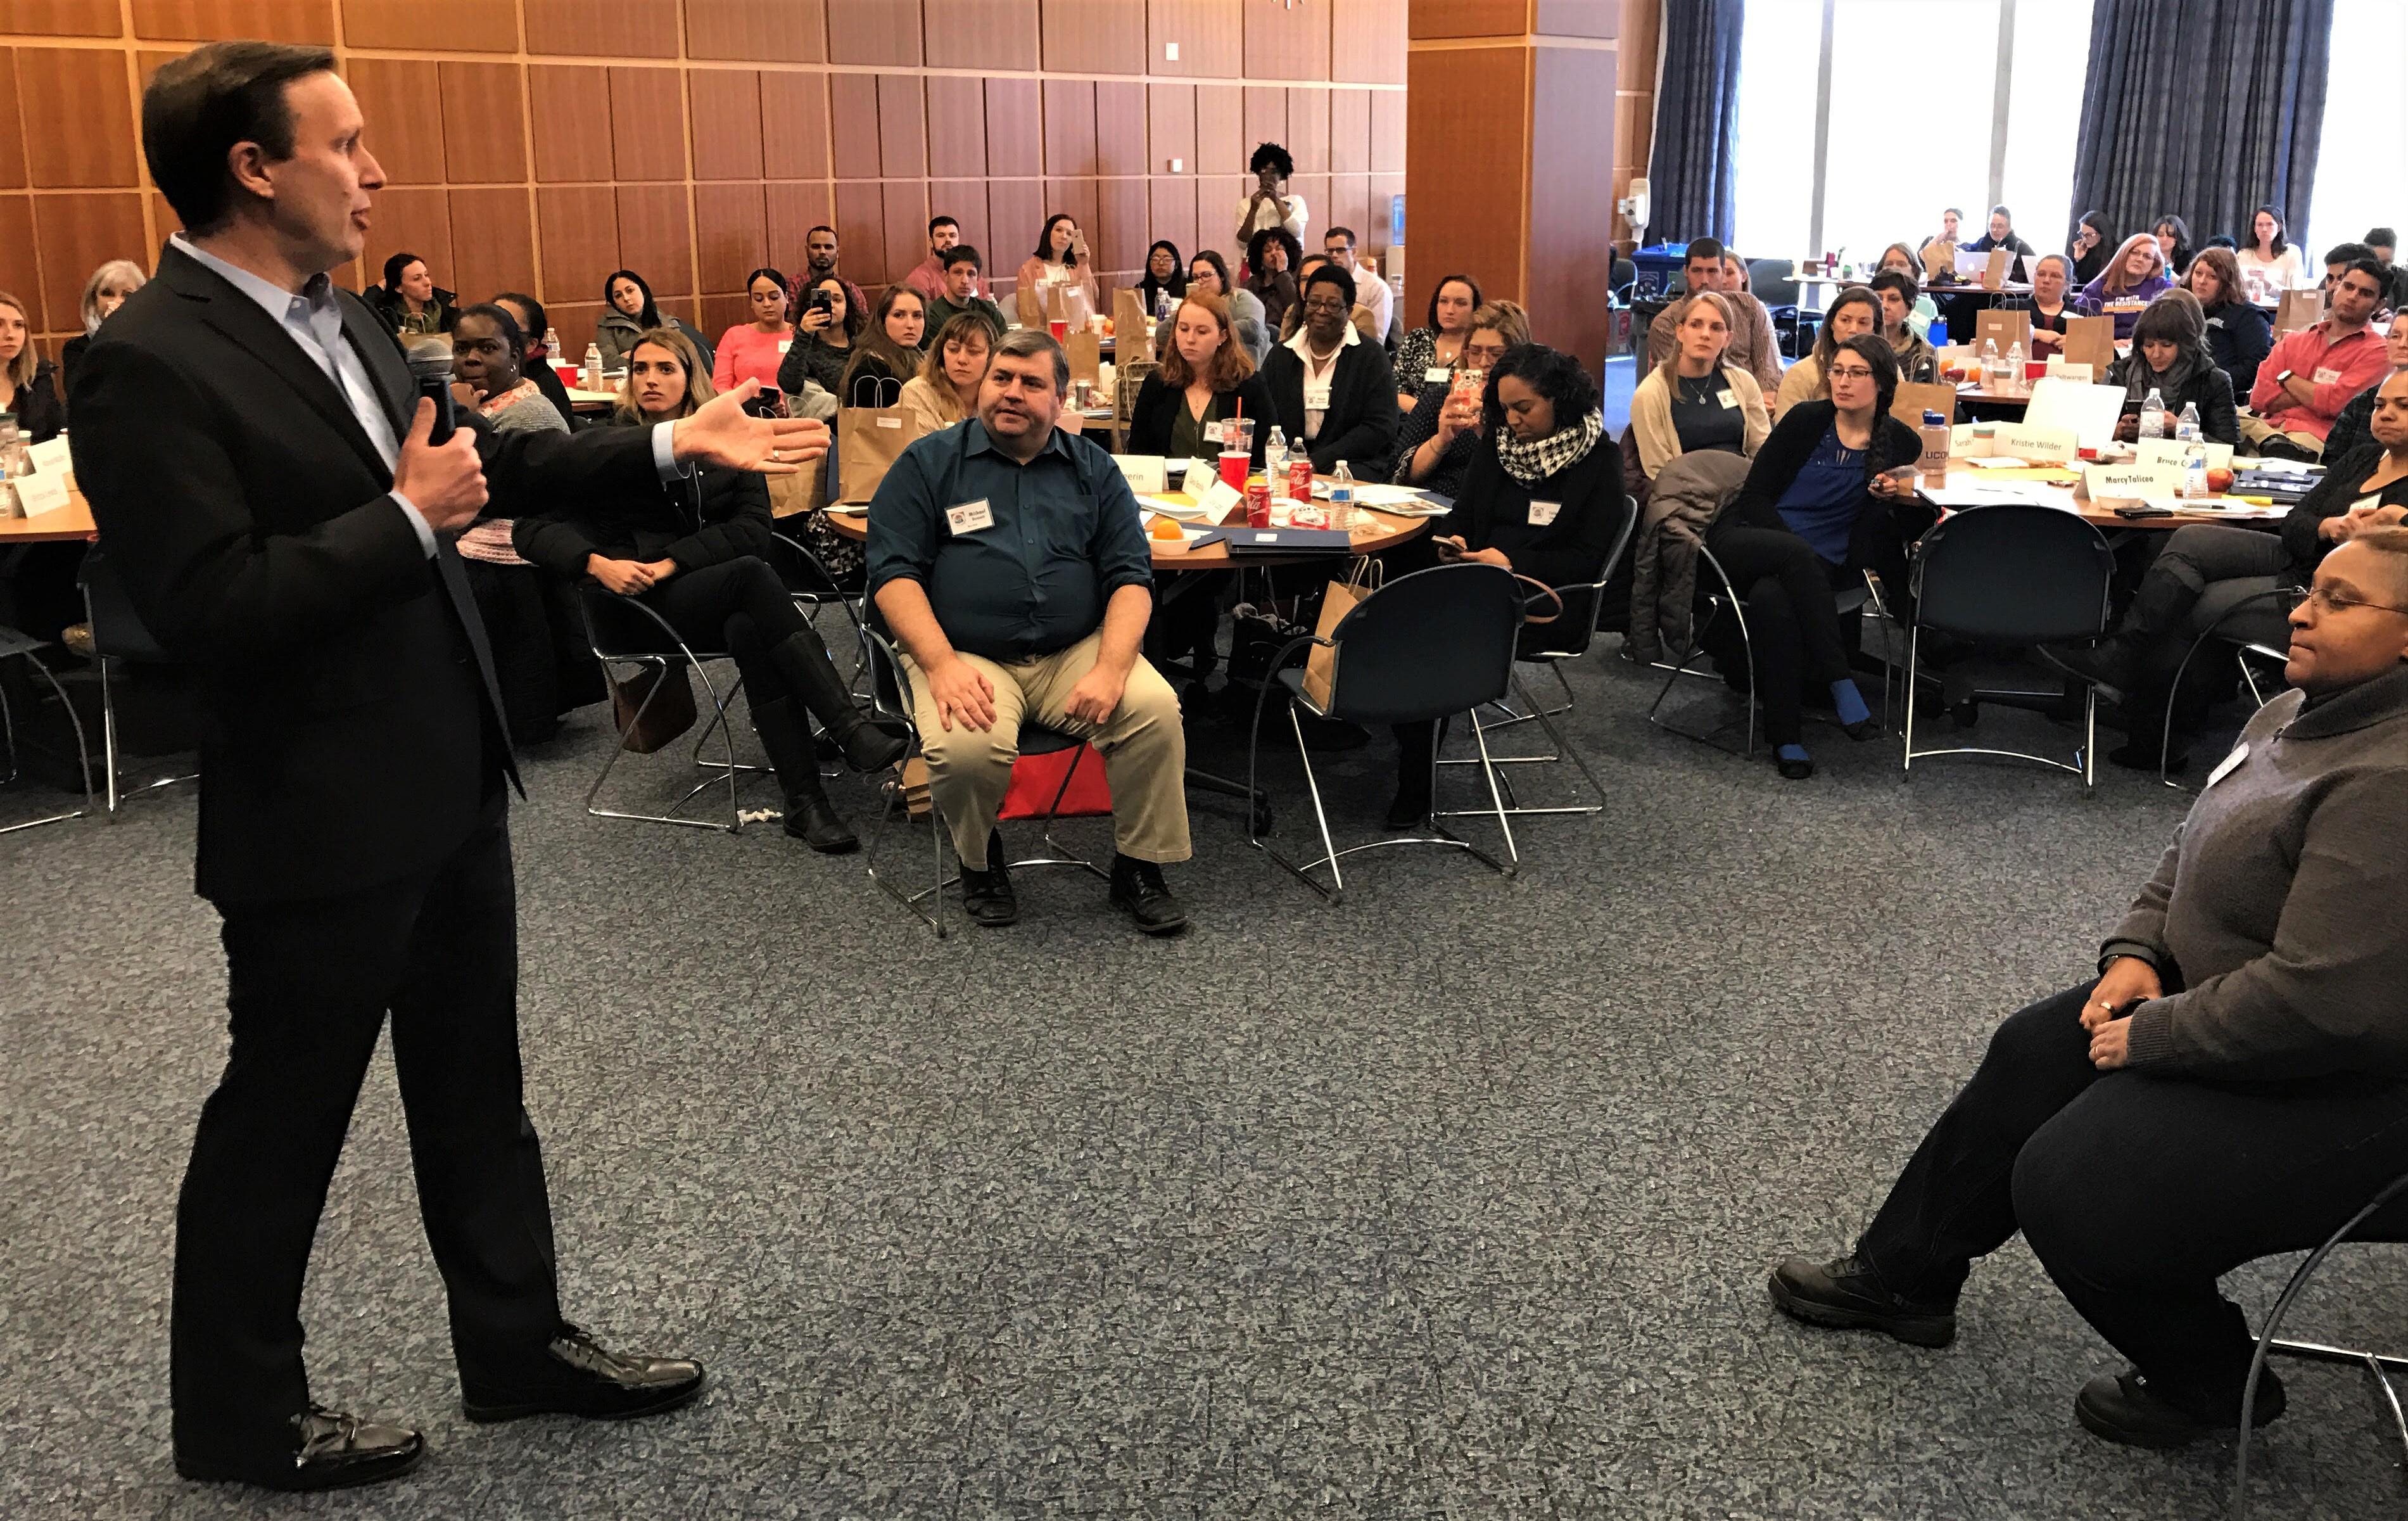 U.S. Sen Chris Murphy speaks to Campaign School participants